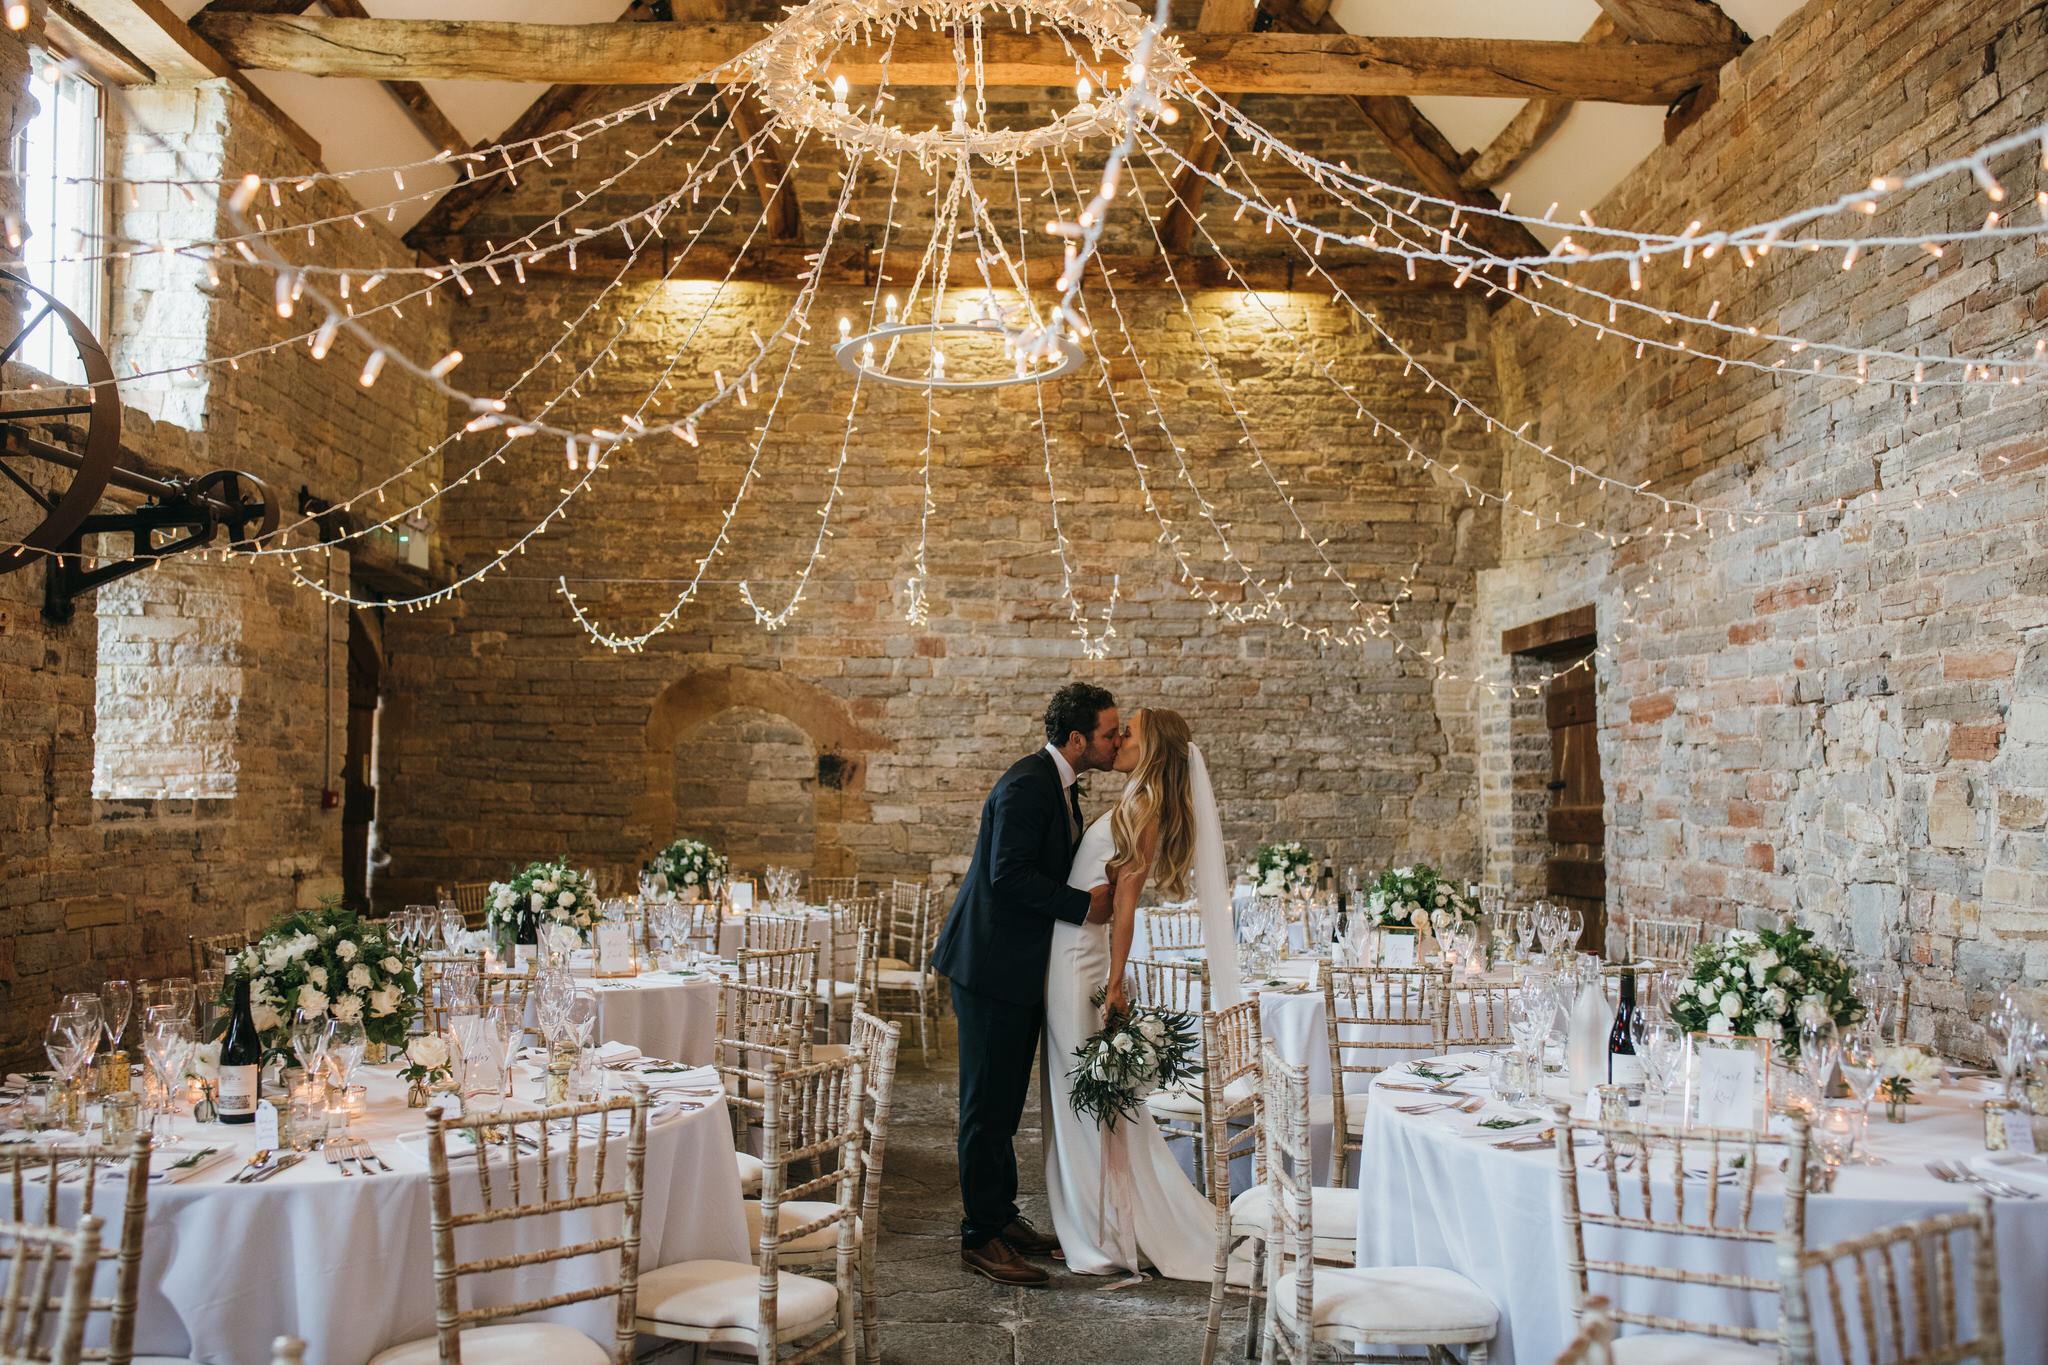 Almonry barn weddings by simon biffen photography 10